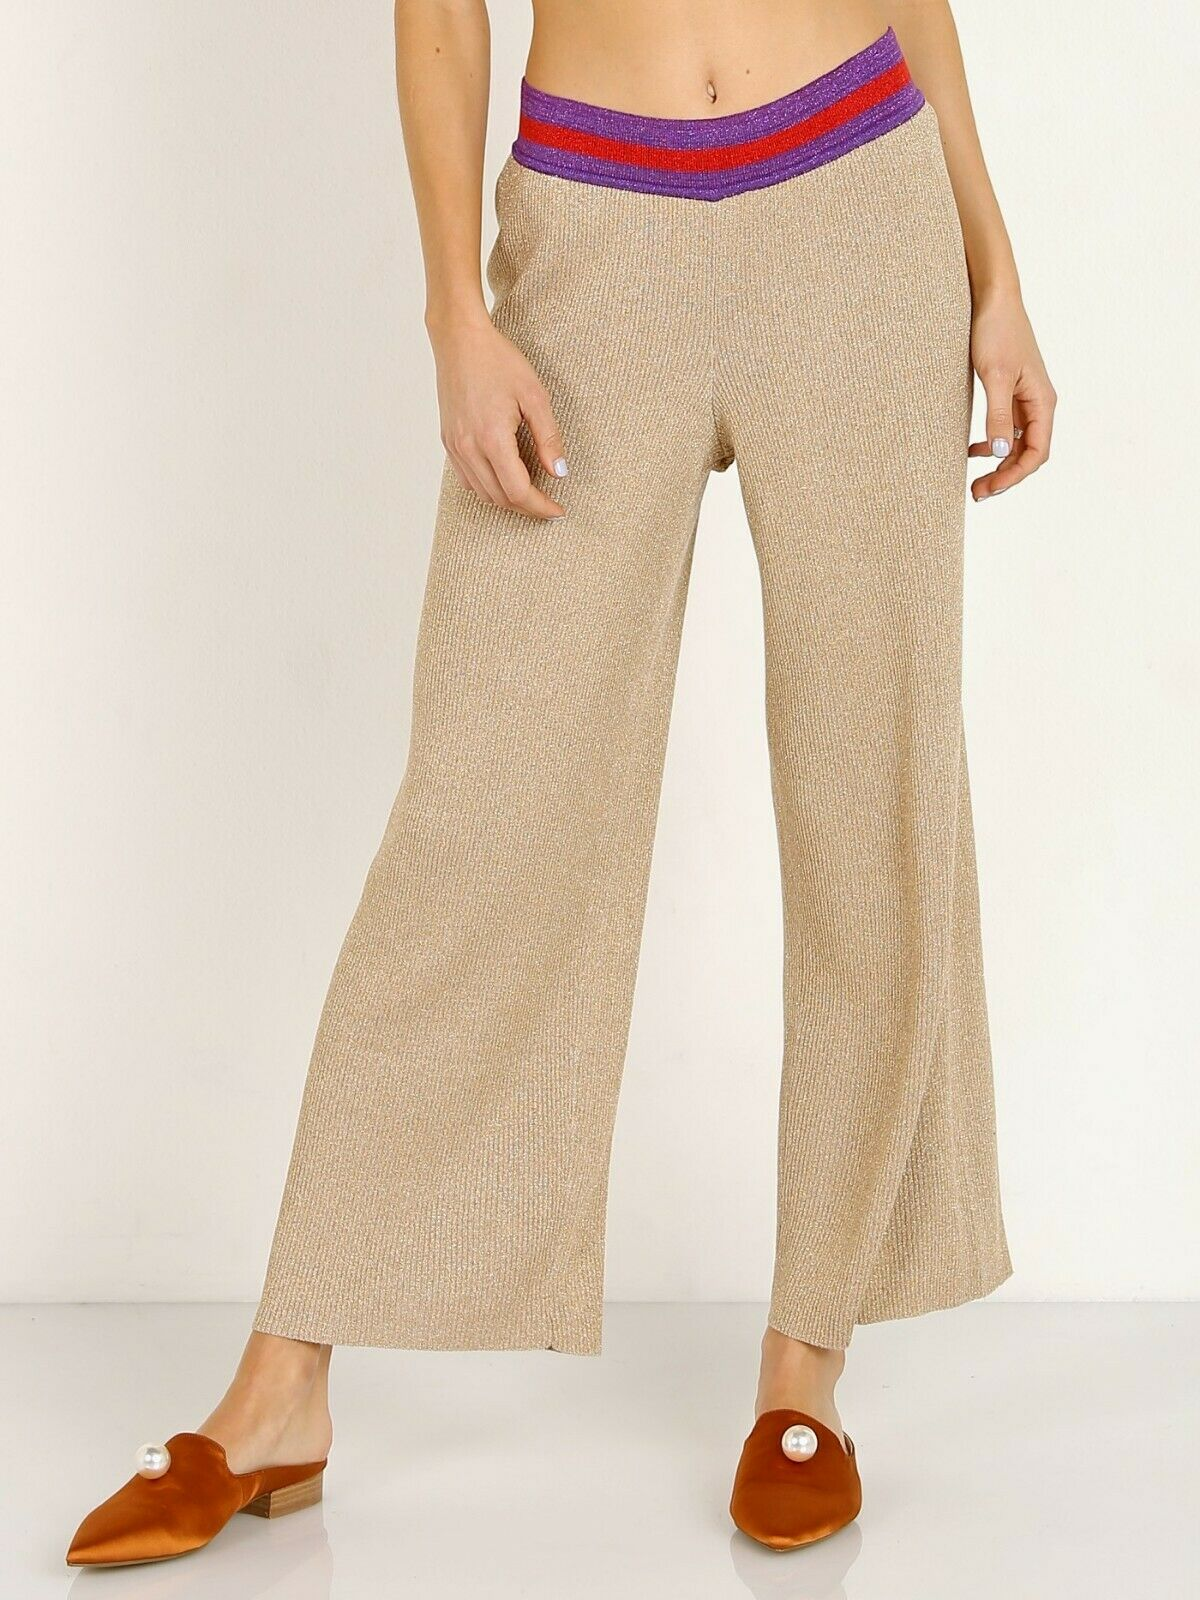 NWT Anthropologie Splendid x Margherita Fiesta Sweater Pants Size S